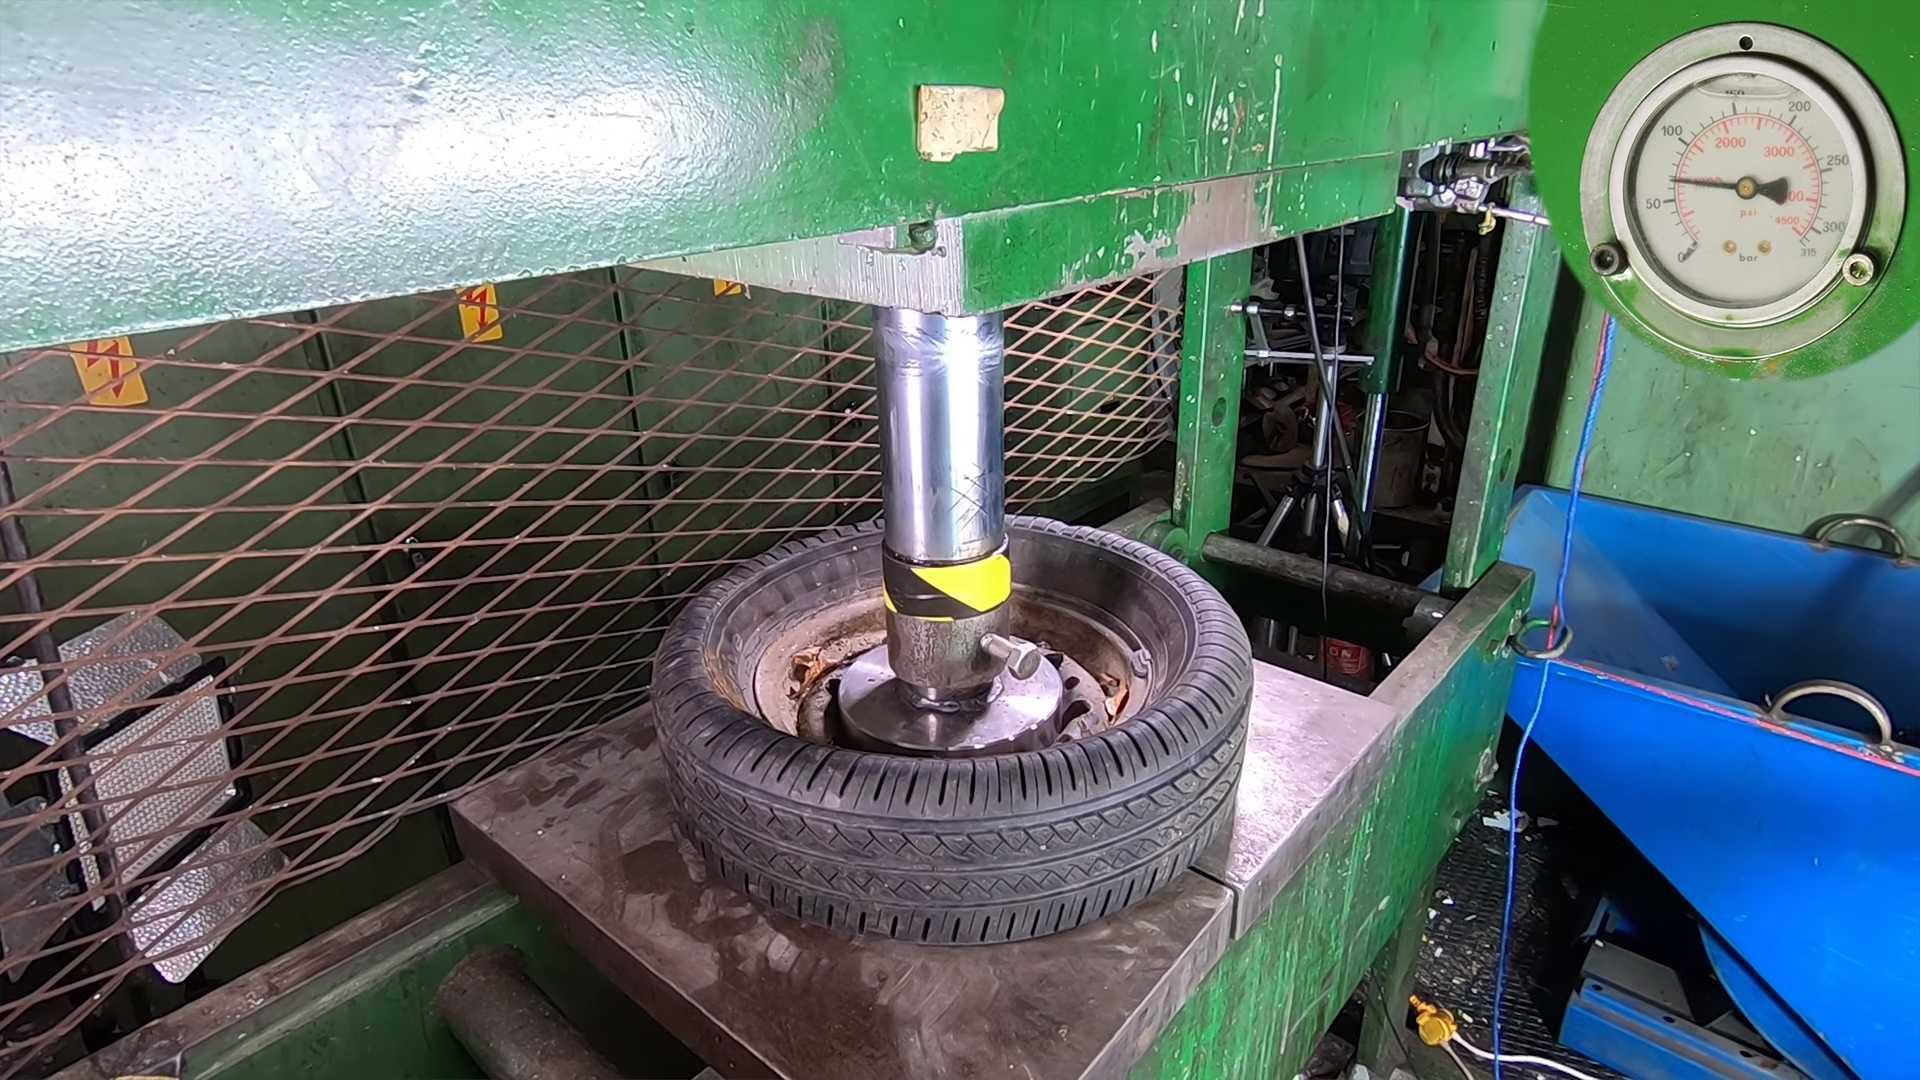 wheel-crushed-in-hydraulic-press Ce fel de roata este mai rezistenta? Janta de otel vs janta de aliaj